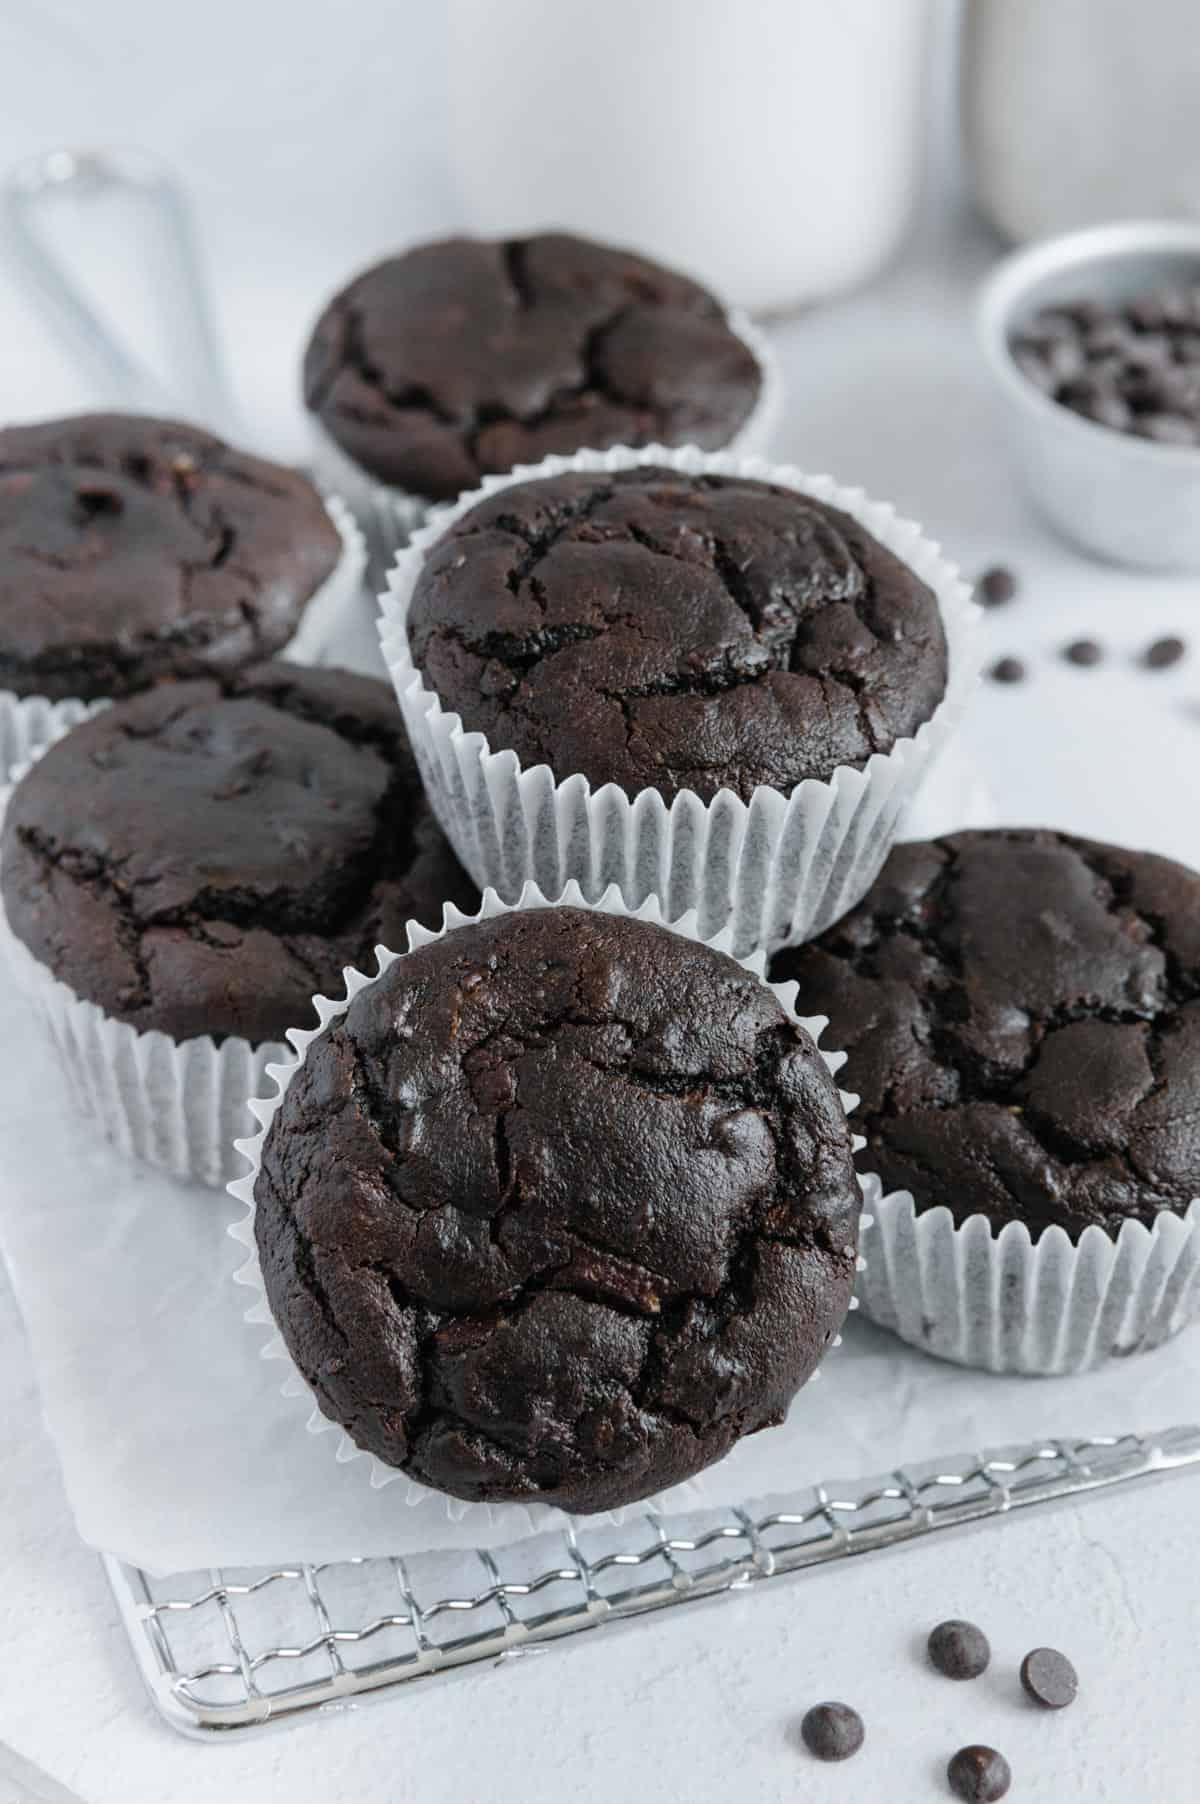 Nut-Free Chocolate Muffins